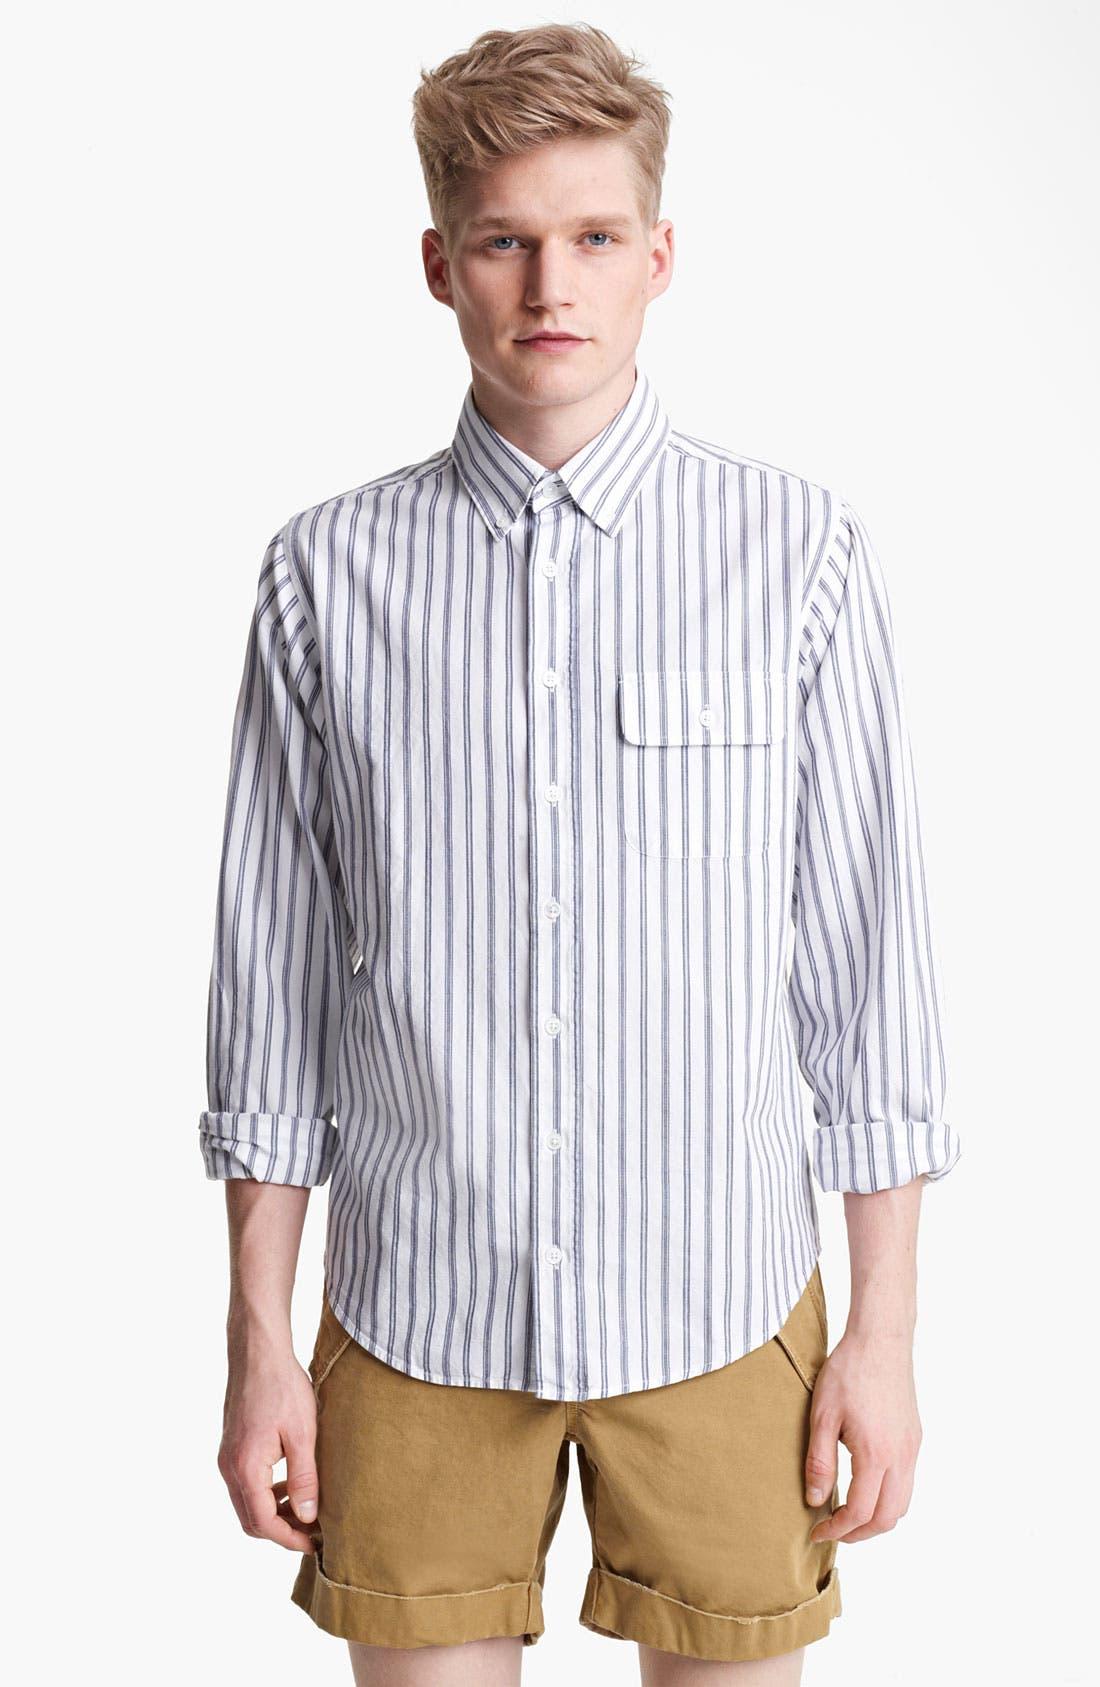 Alternate Image 1 Selected - Gant by Michael Bastian Ticking Stripe Woven Shirt